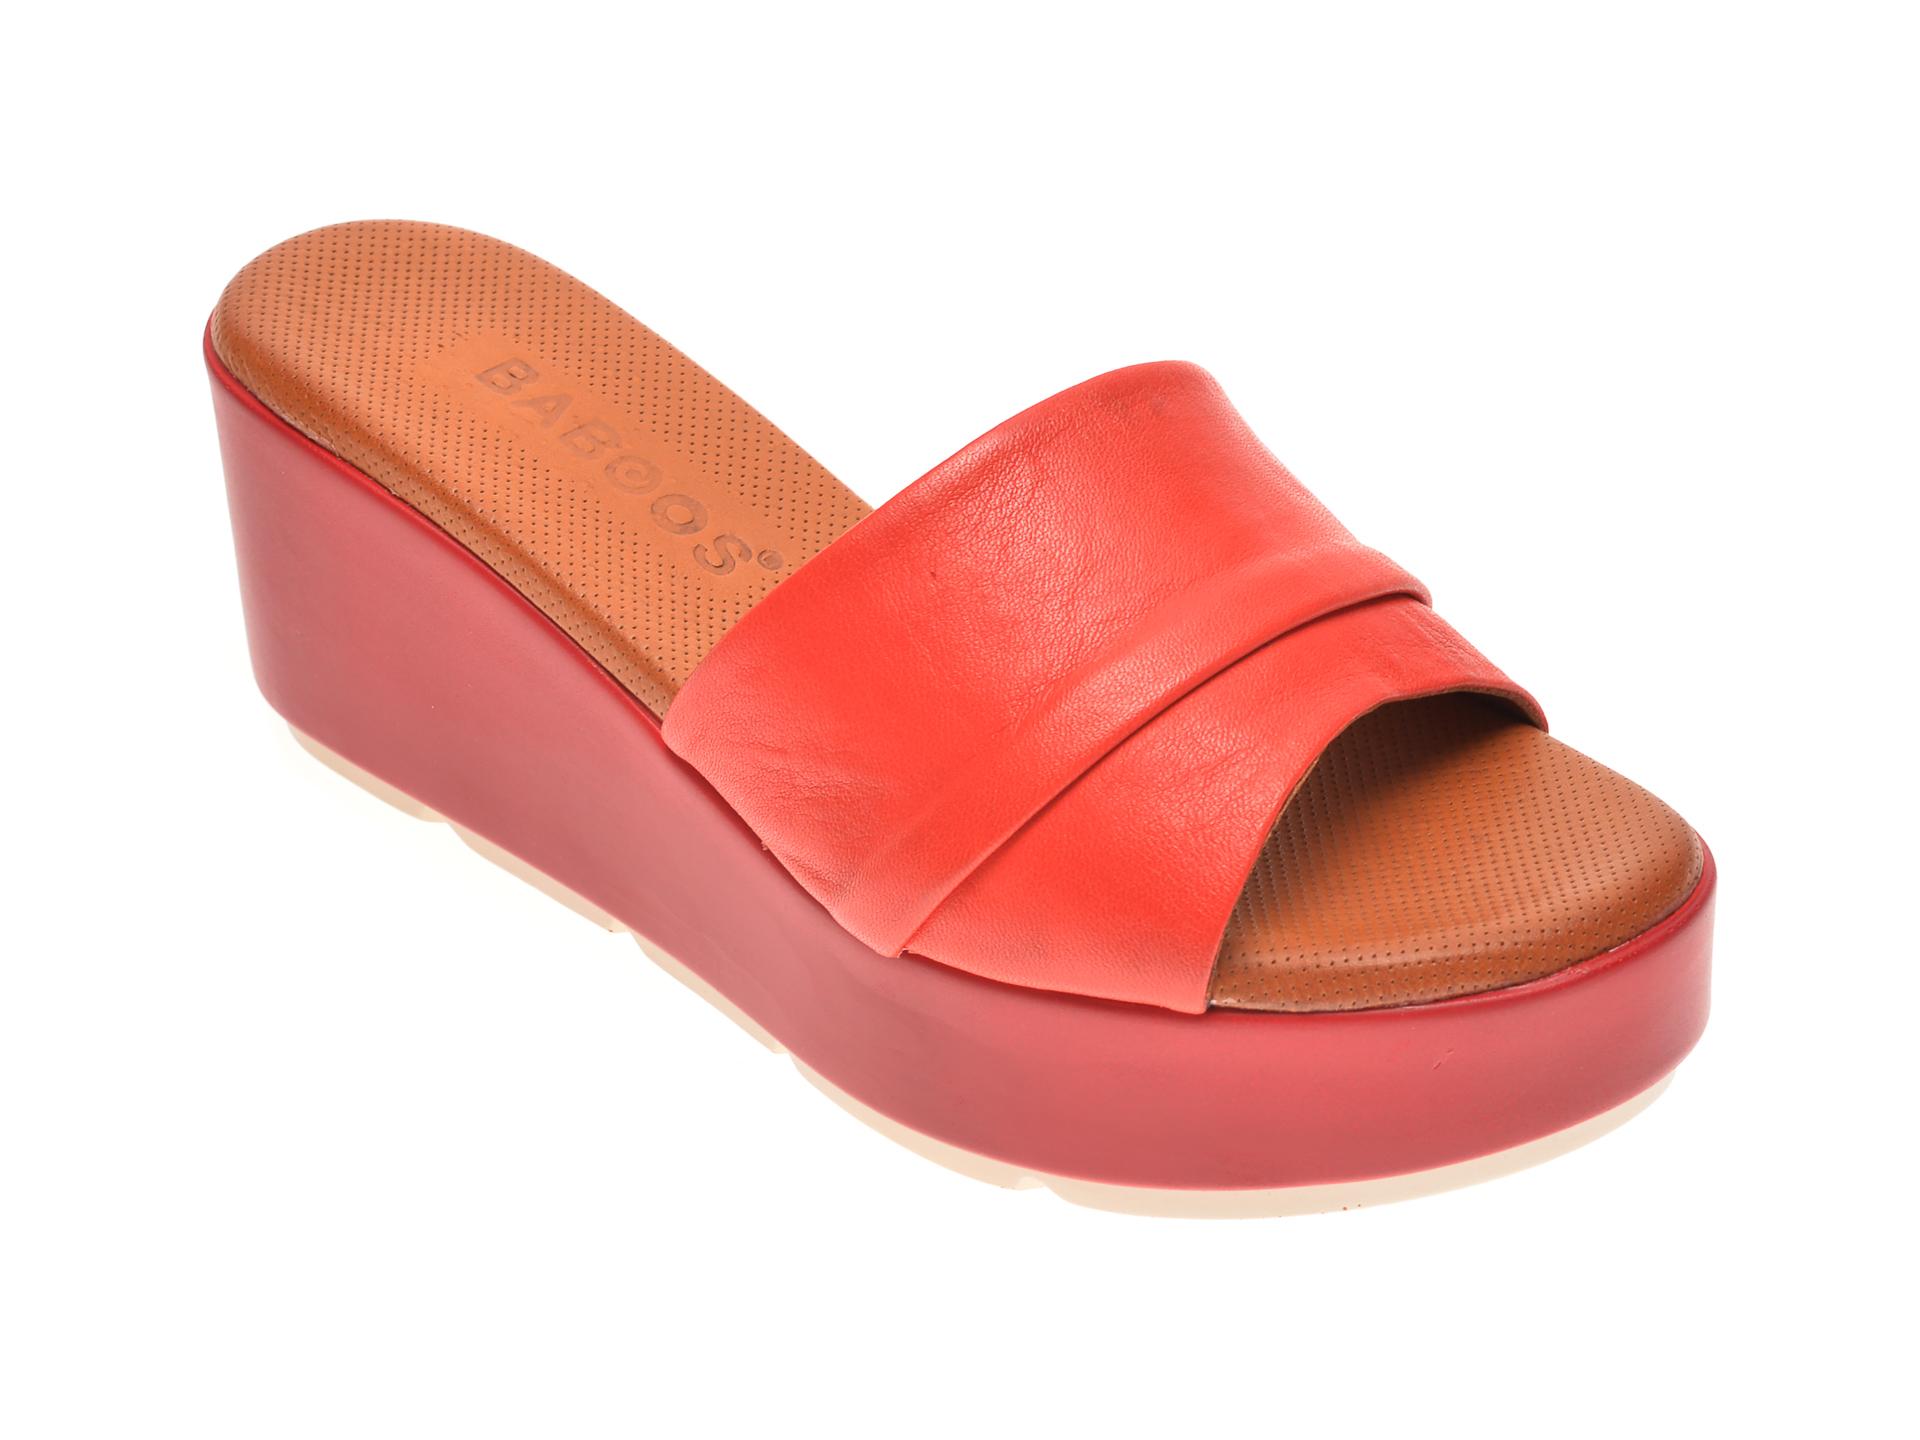 Papuci BABOOS rosii, 2517, din piele naturala imagine